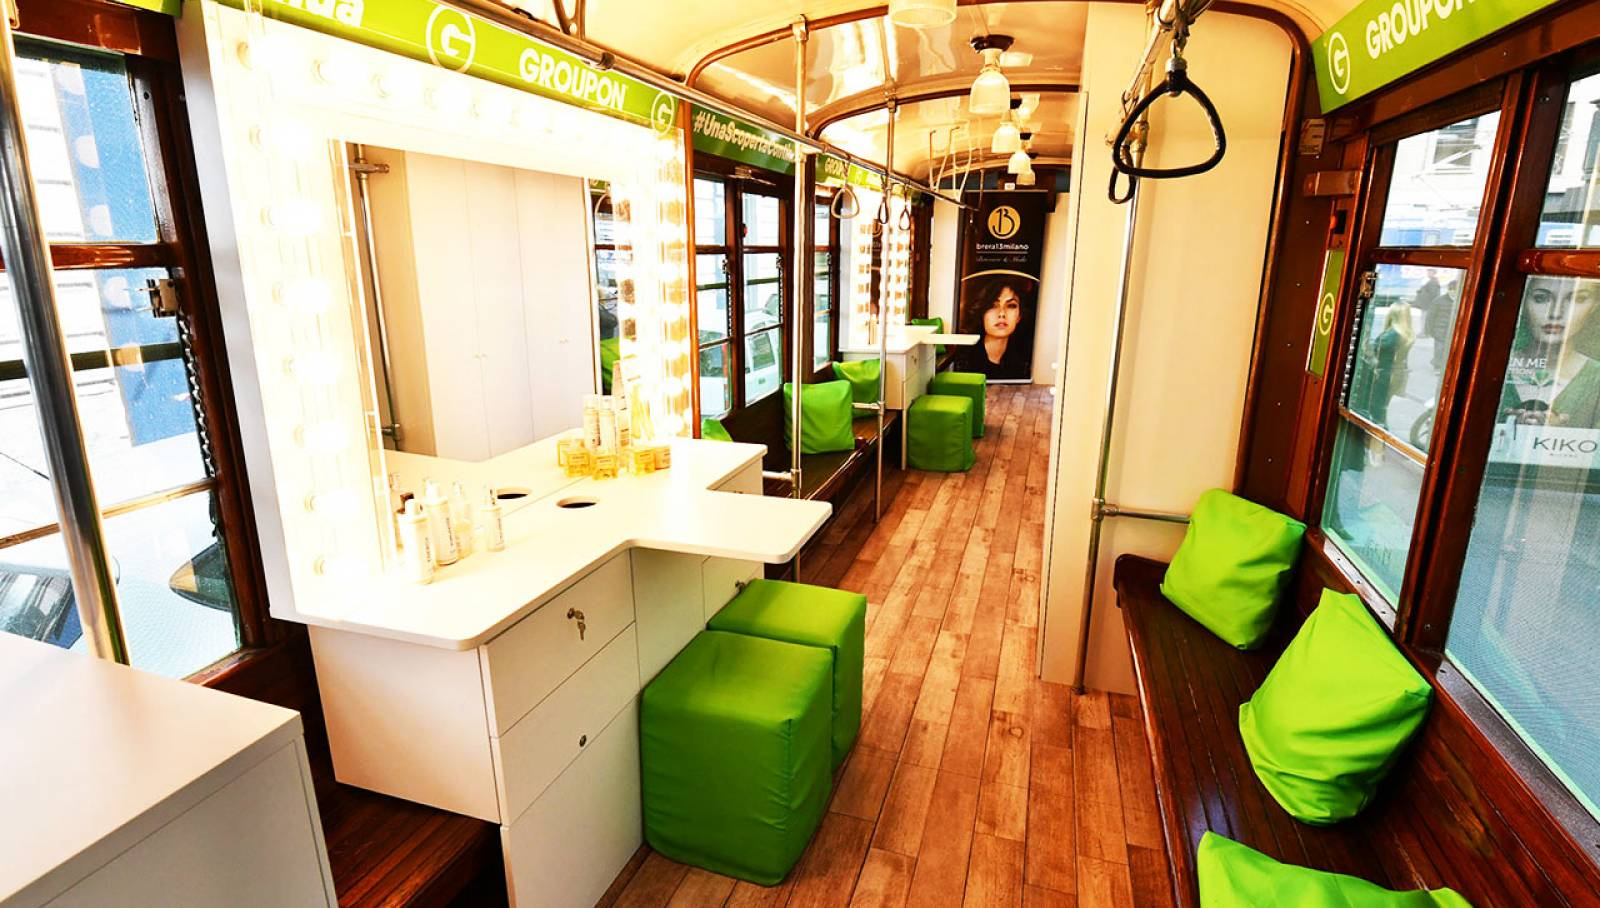 Pubblicità OOH a Milano IGPDecaux tram speciale per Groupon